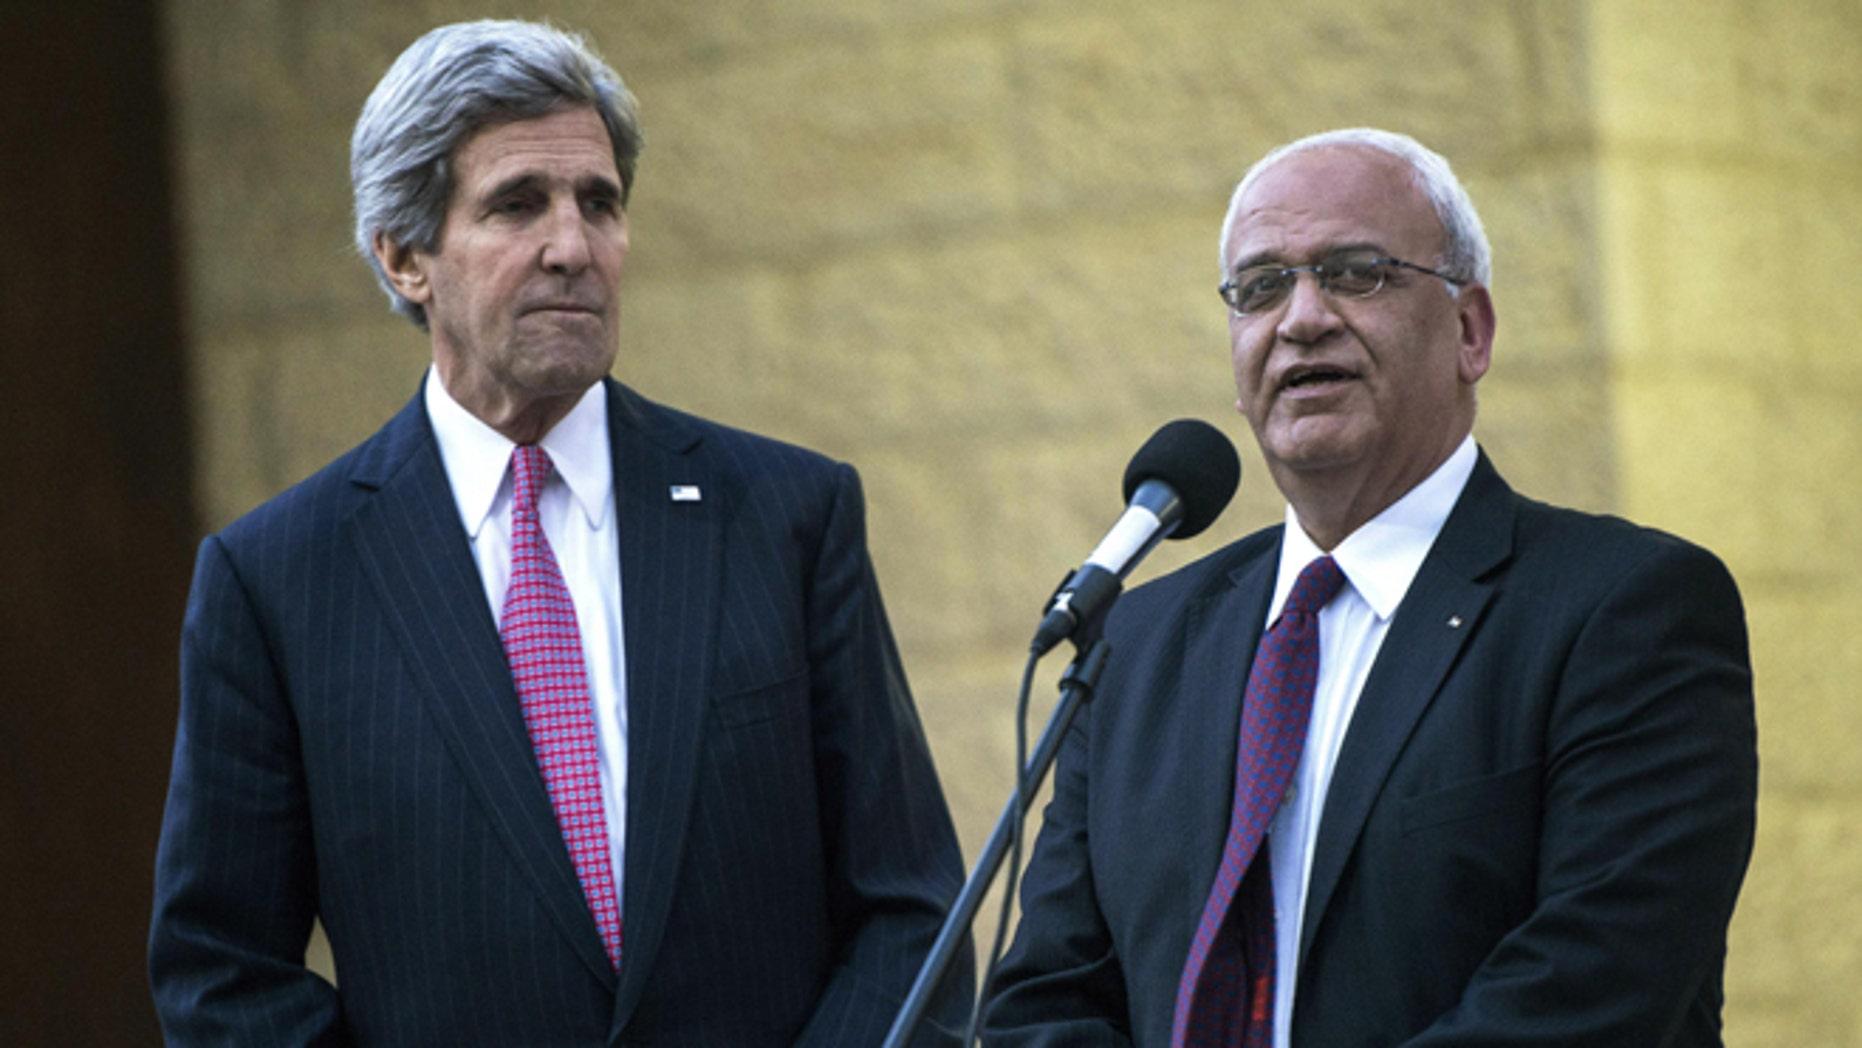 Jan. 4, 2014: Secretary of State John Kerry, left, and Palestinian negotiator Saeb Erekat at the Palestinian in the West Bank city of Ramallah.